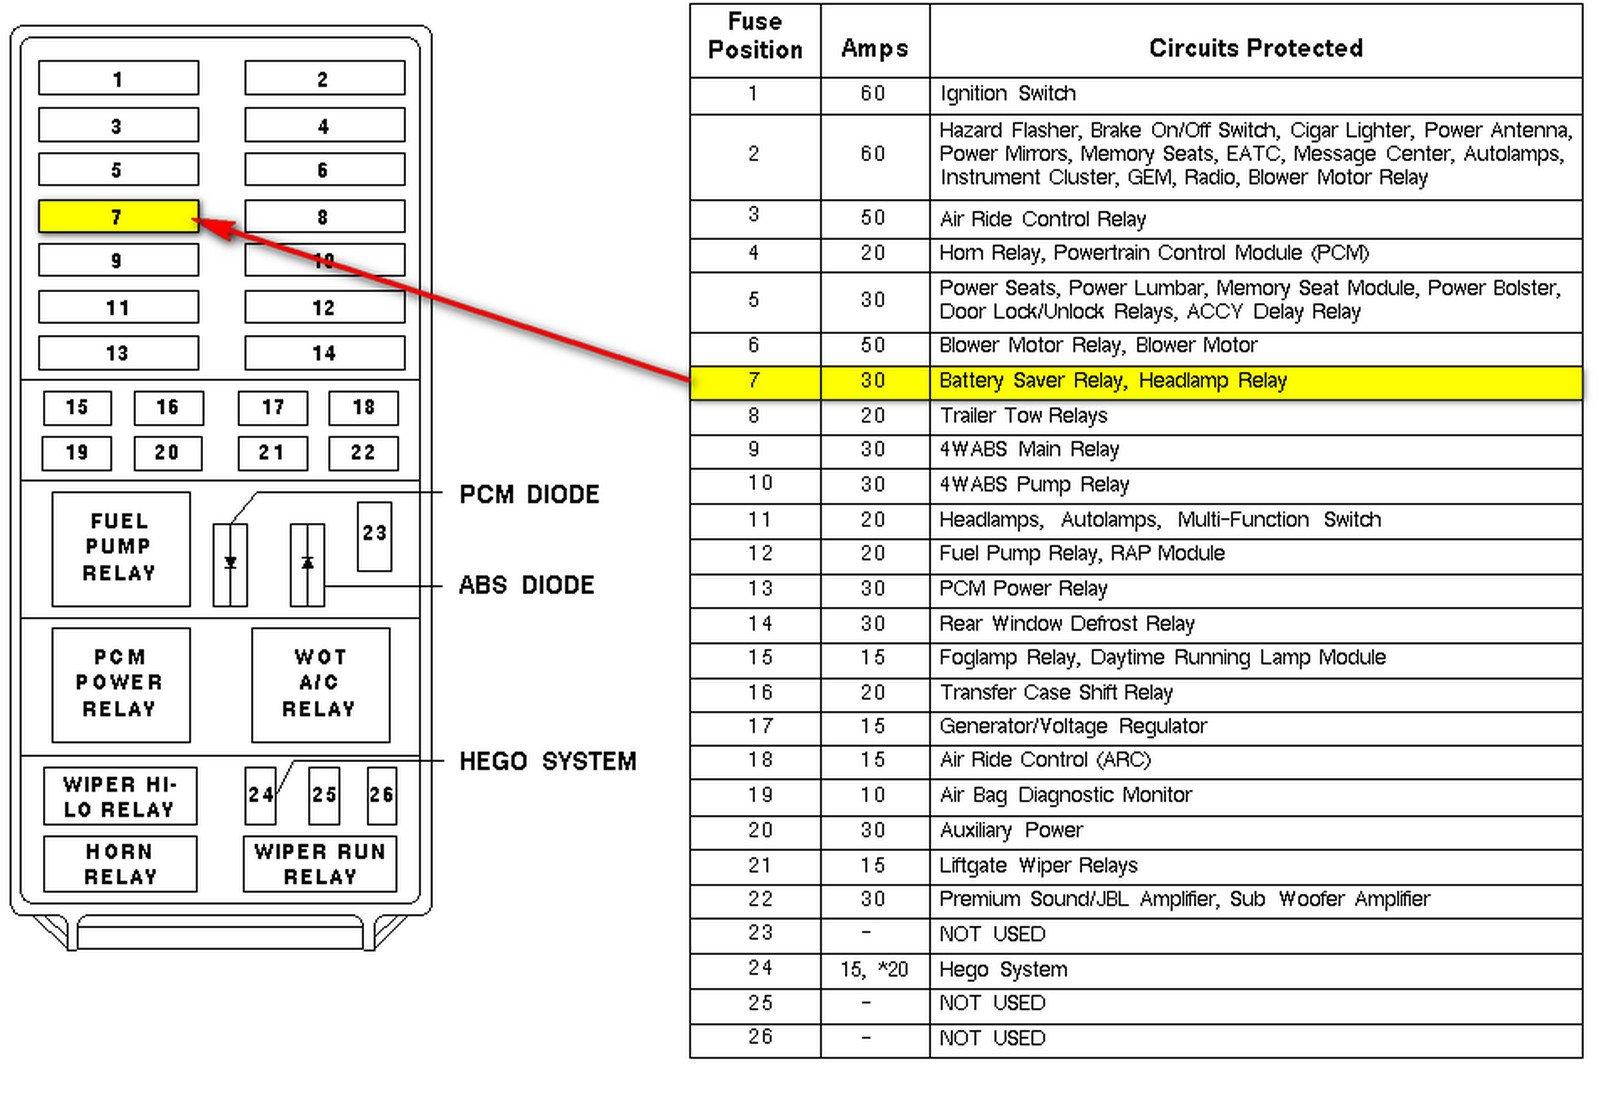 96 Explorer Fuse Diagram - Wiring Diagrams IMG gray -  gray.farmaciastorelli.it